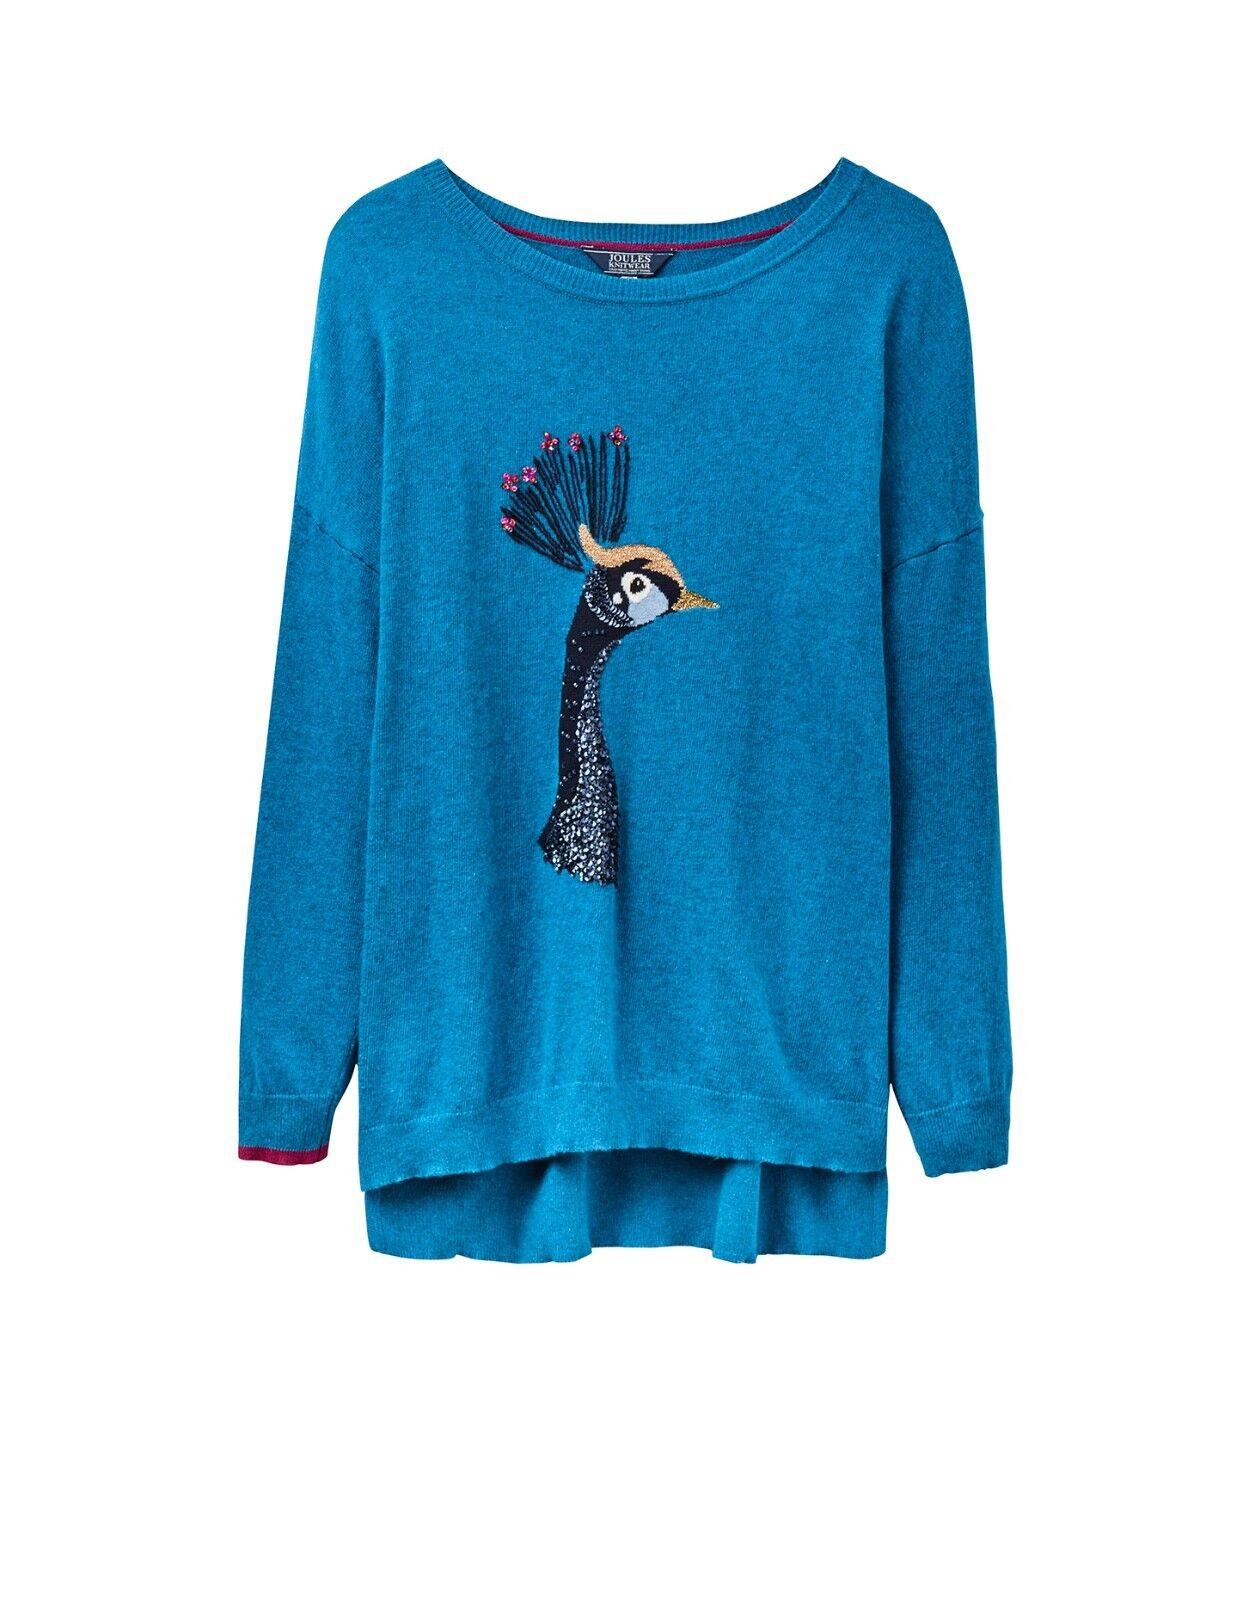 Joules Meryl Intarsia Girls Jumper Sweater Dalmation All Sizes